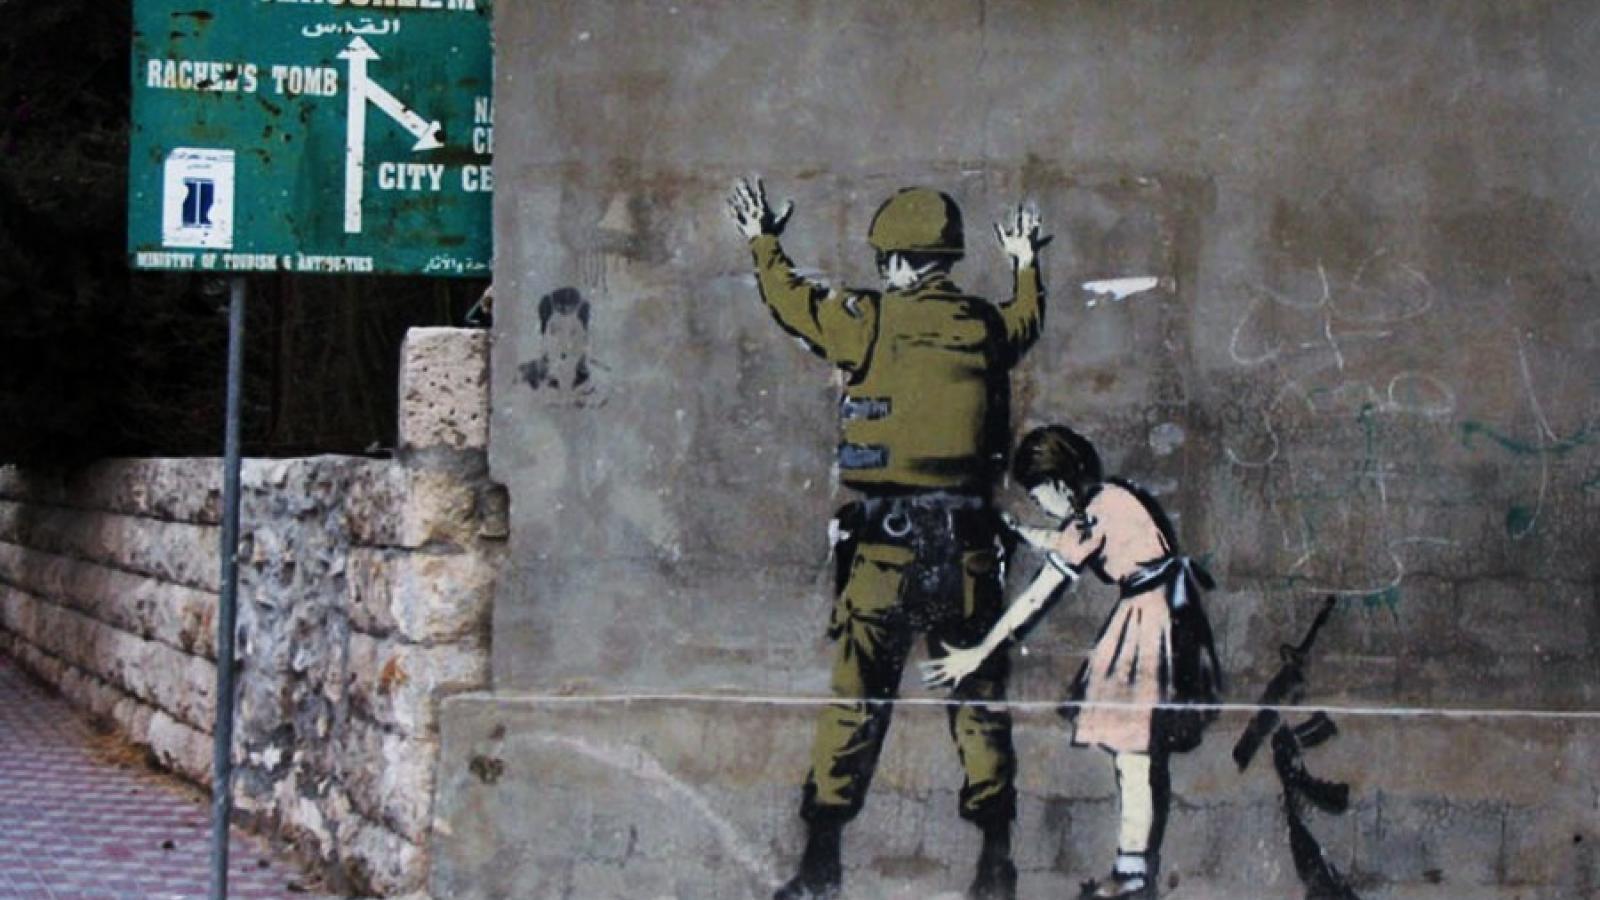 Free Download Banksy Street Art Wallpaper Hq Wallpaper